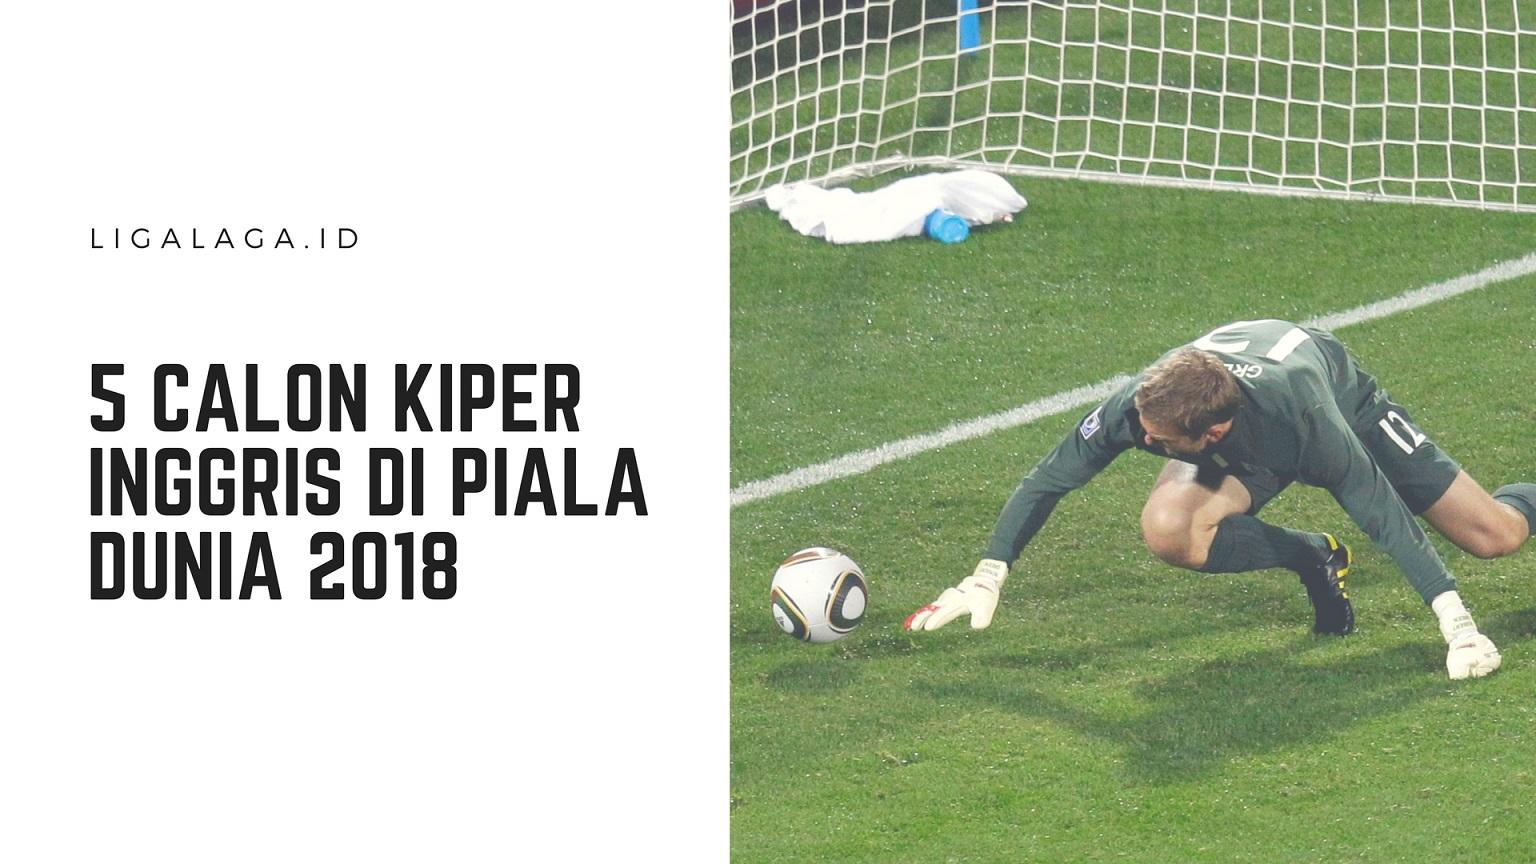 5 Calon Kiper Inggris Di Piala Dunia 2018 Ligalaga